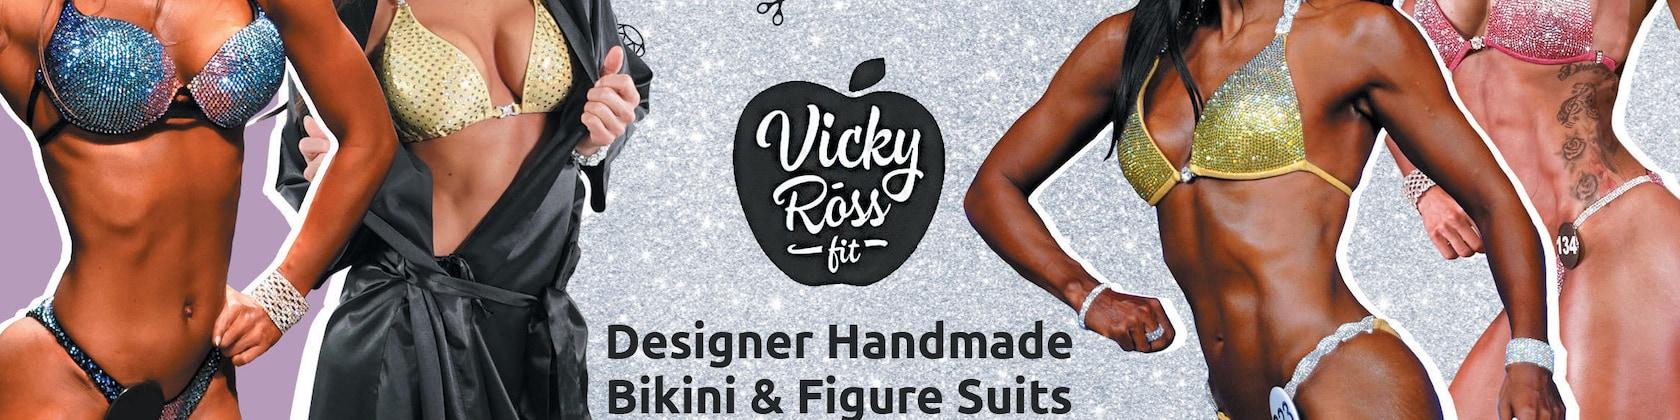 437562ba57 Designer Competition Bikini Figure Suits Swimwear by VickyRossFit